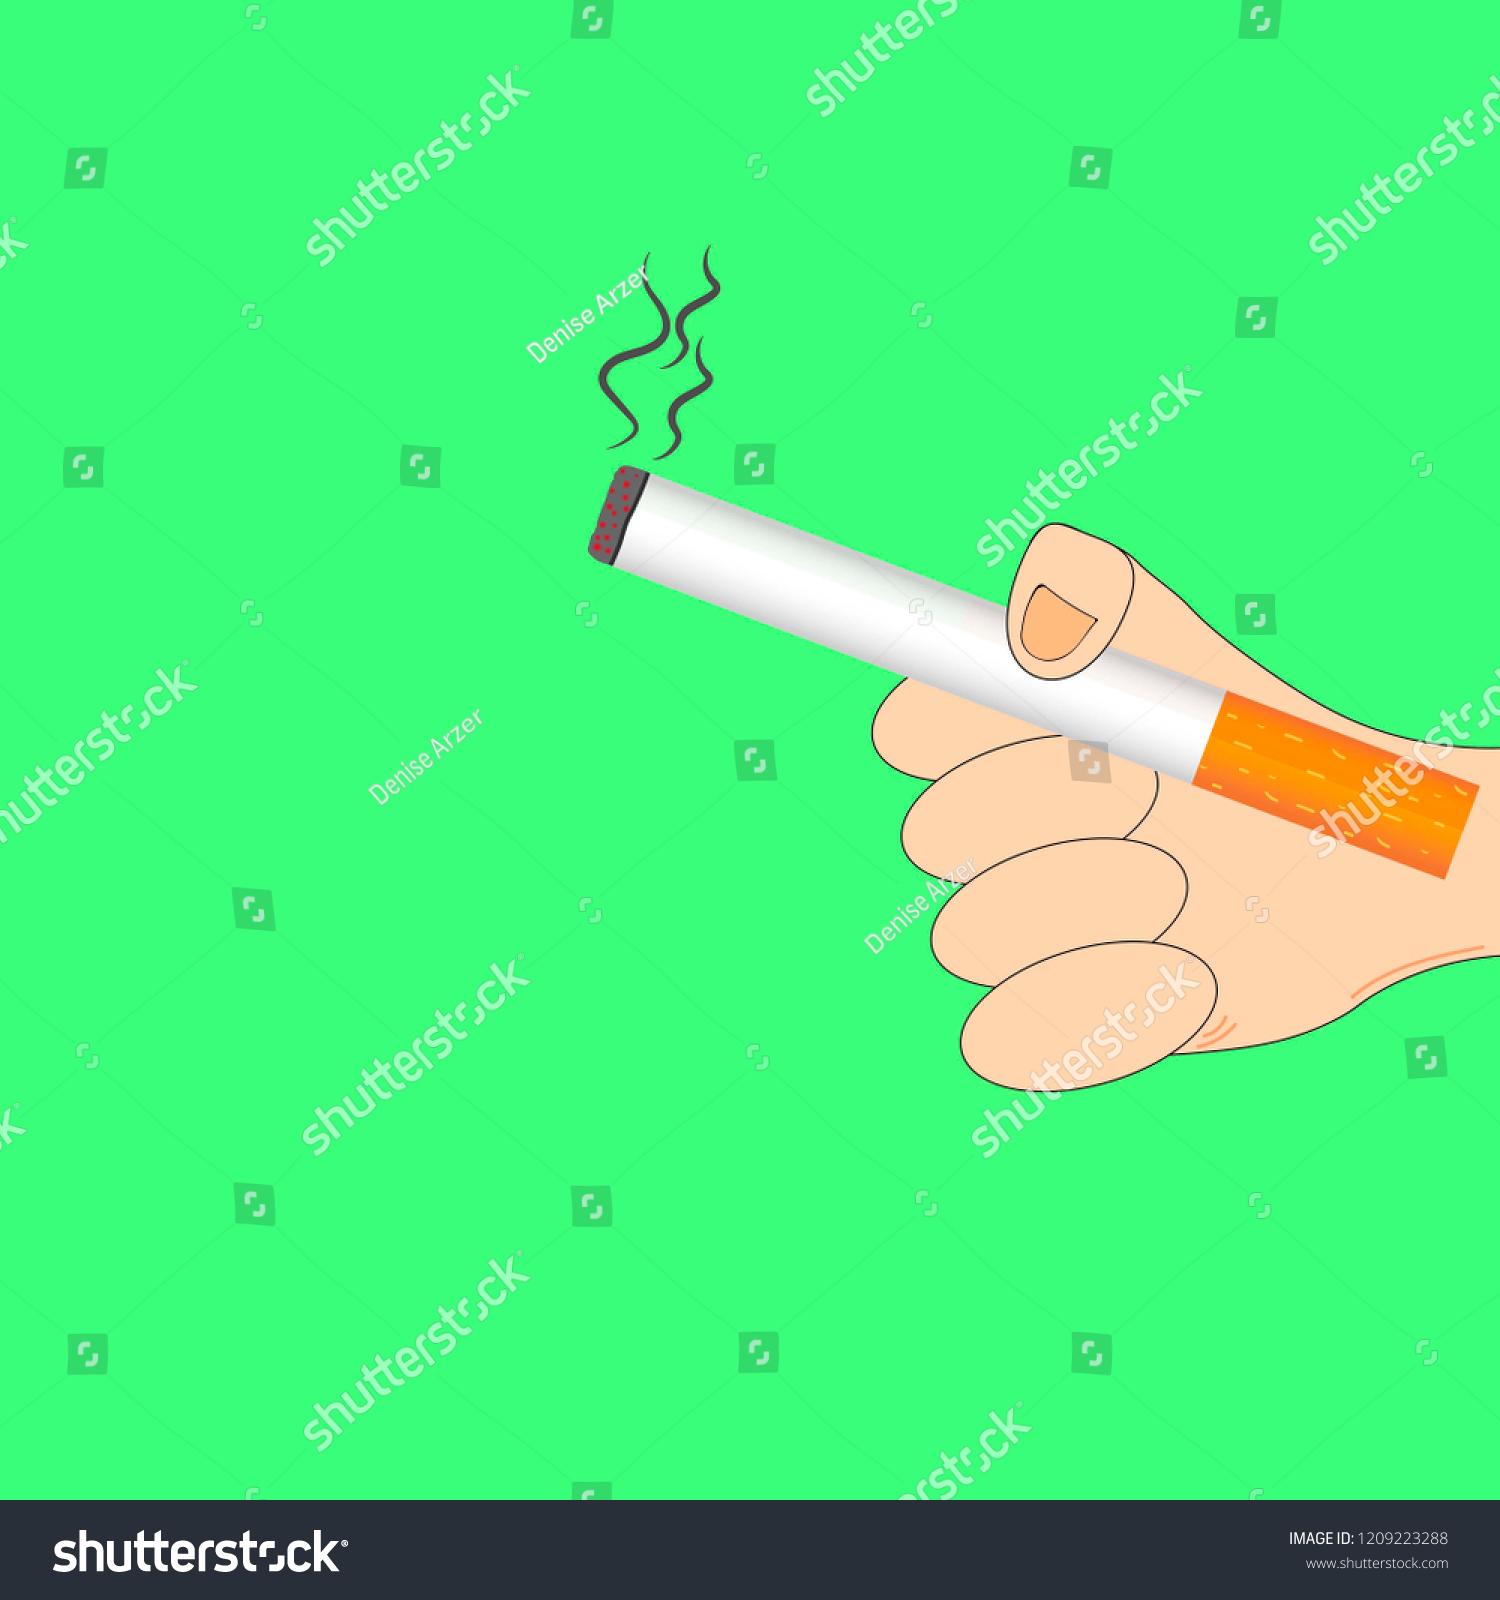 Cigarette Caricature caricature hand person holding cigarette stock vector (royalty free